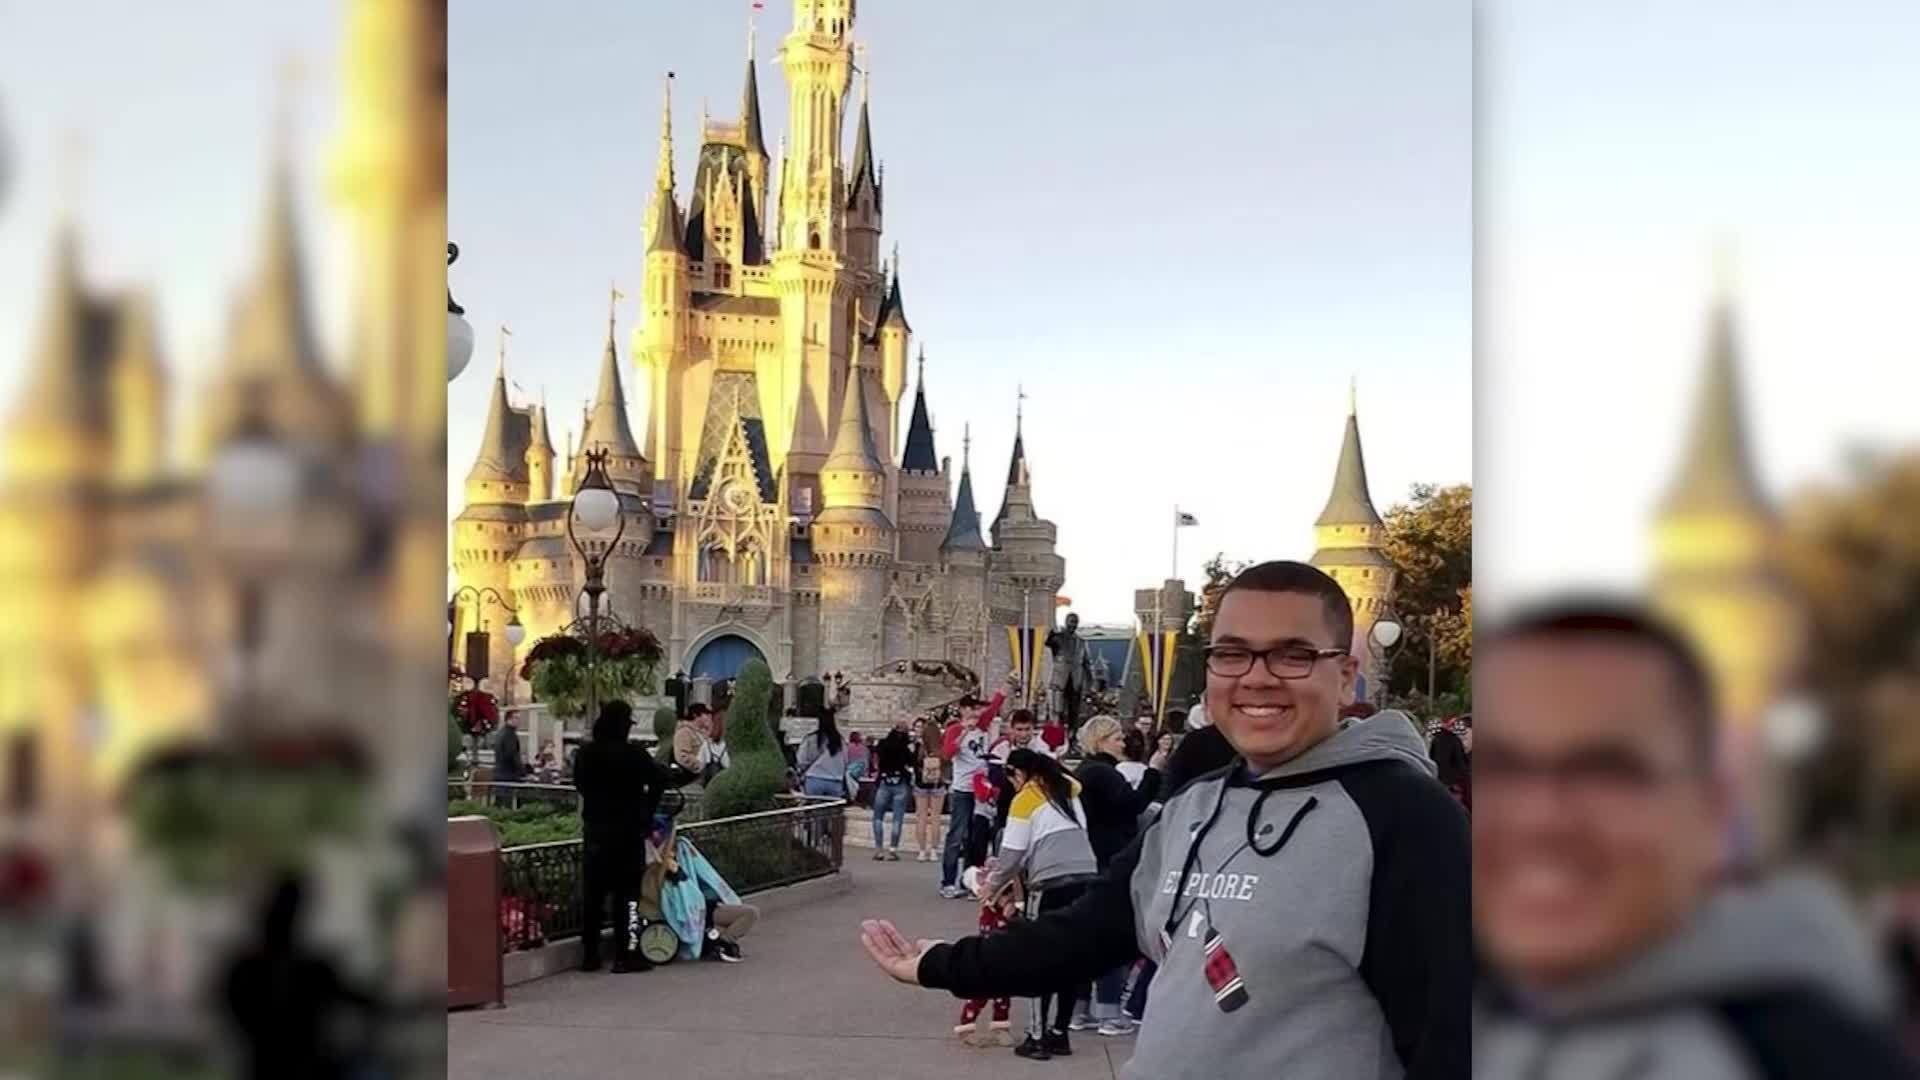 Teen sells enough cupcakes to take his entire family to Disney World